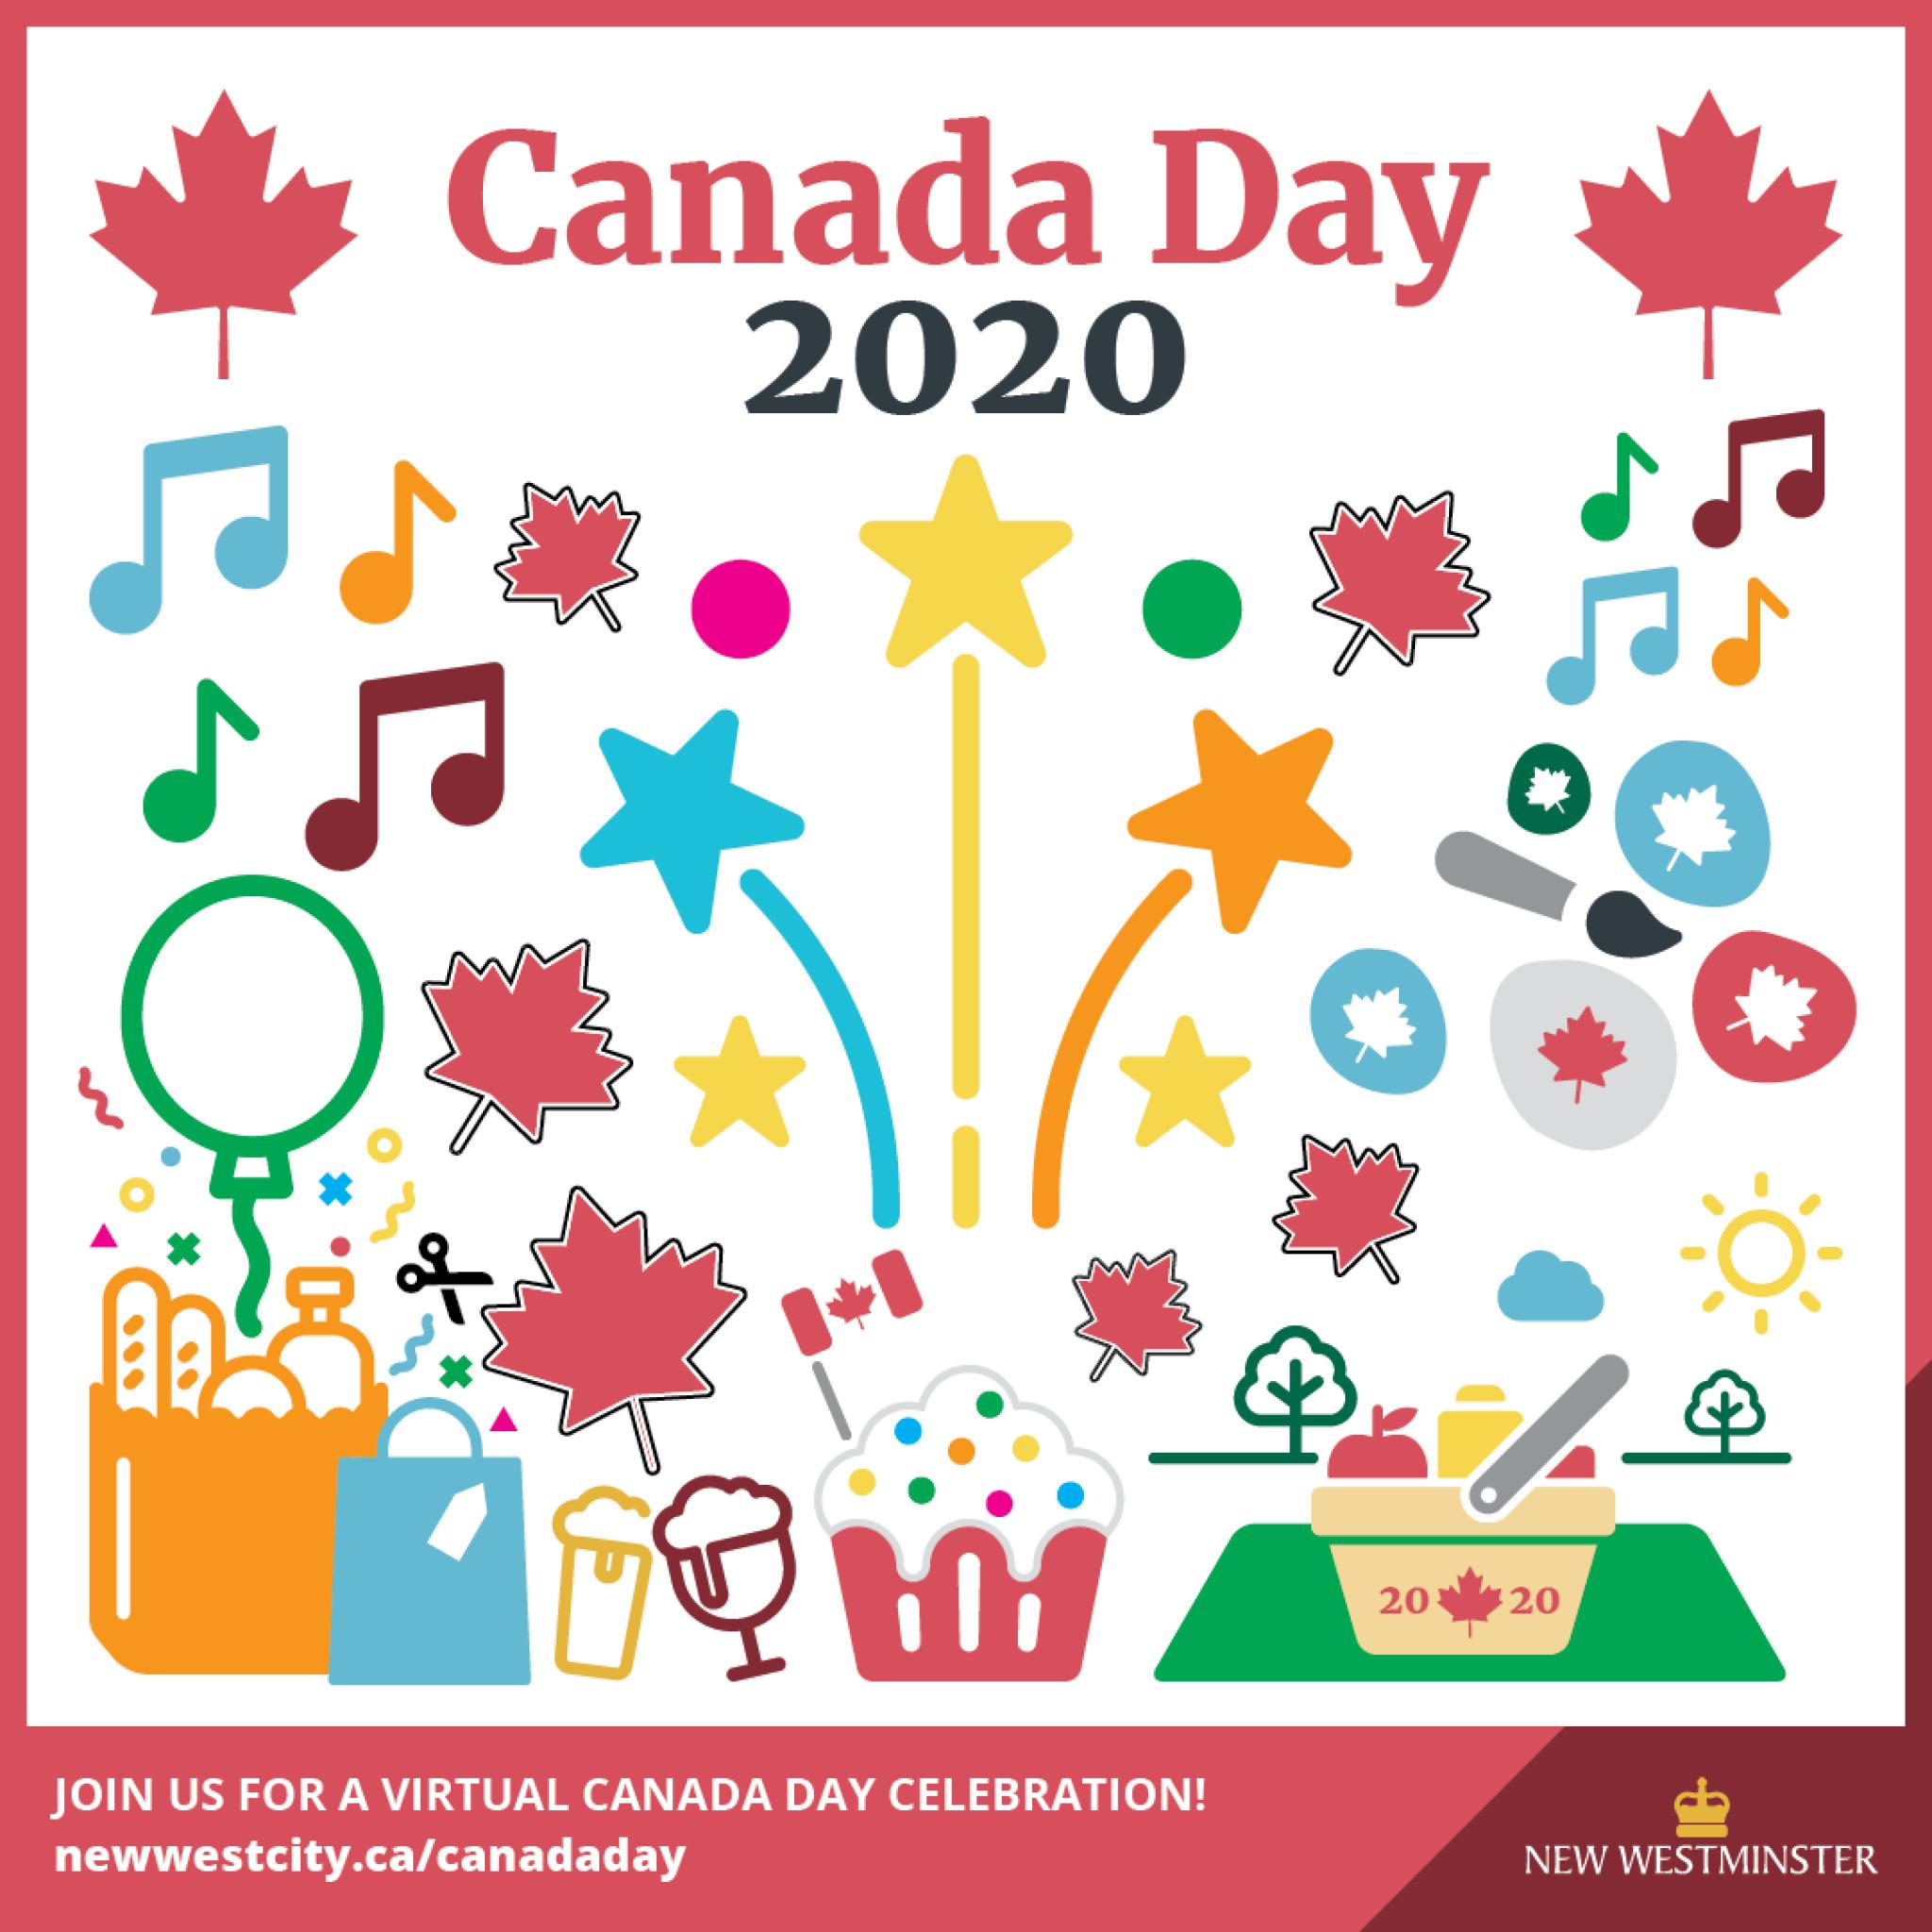 canada day 2020 - photo #47